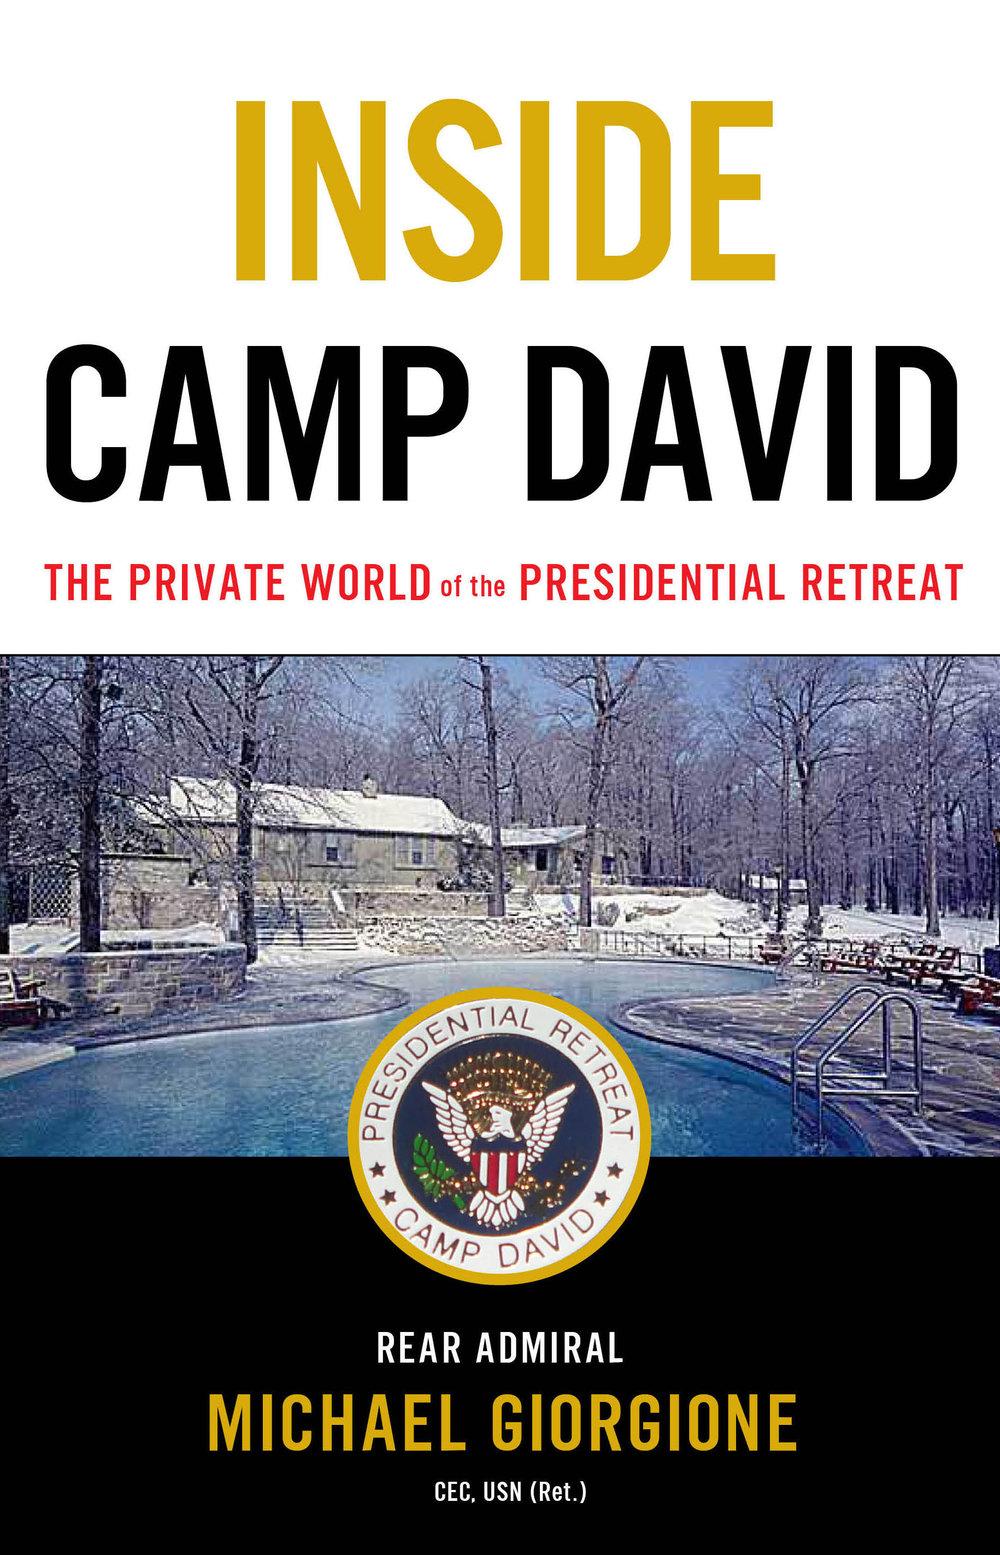 Inside Camp David by Michael Giorgione